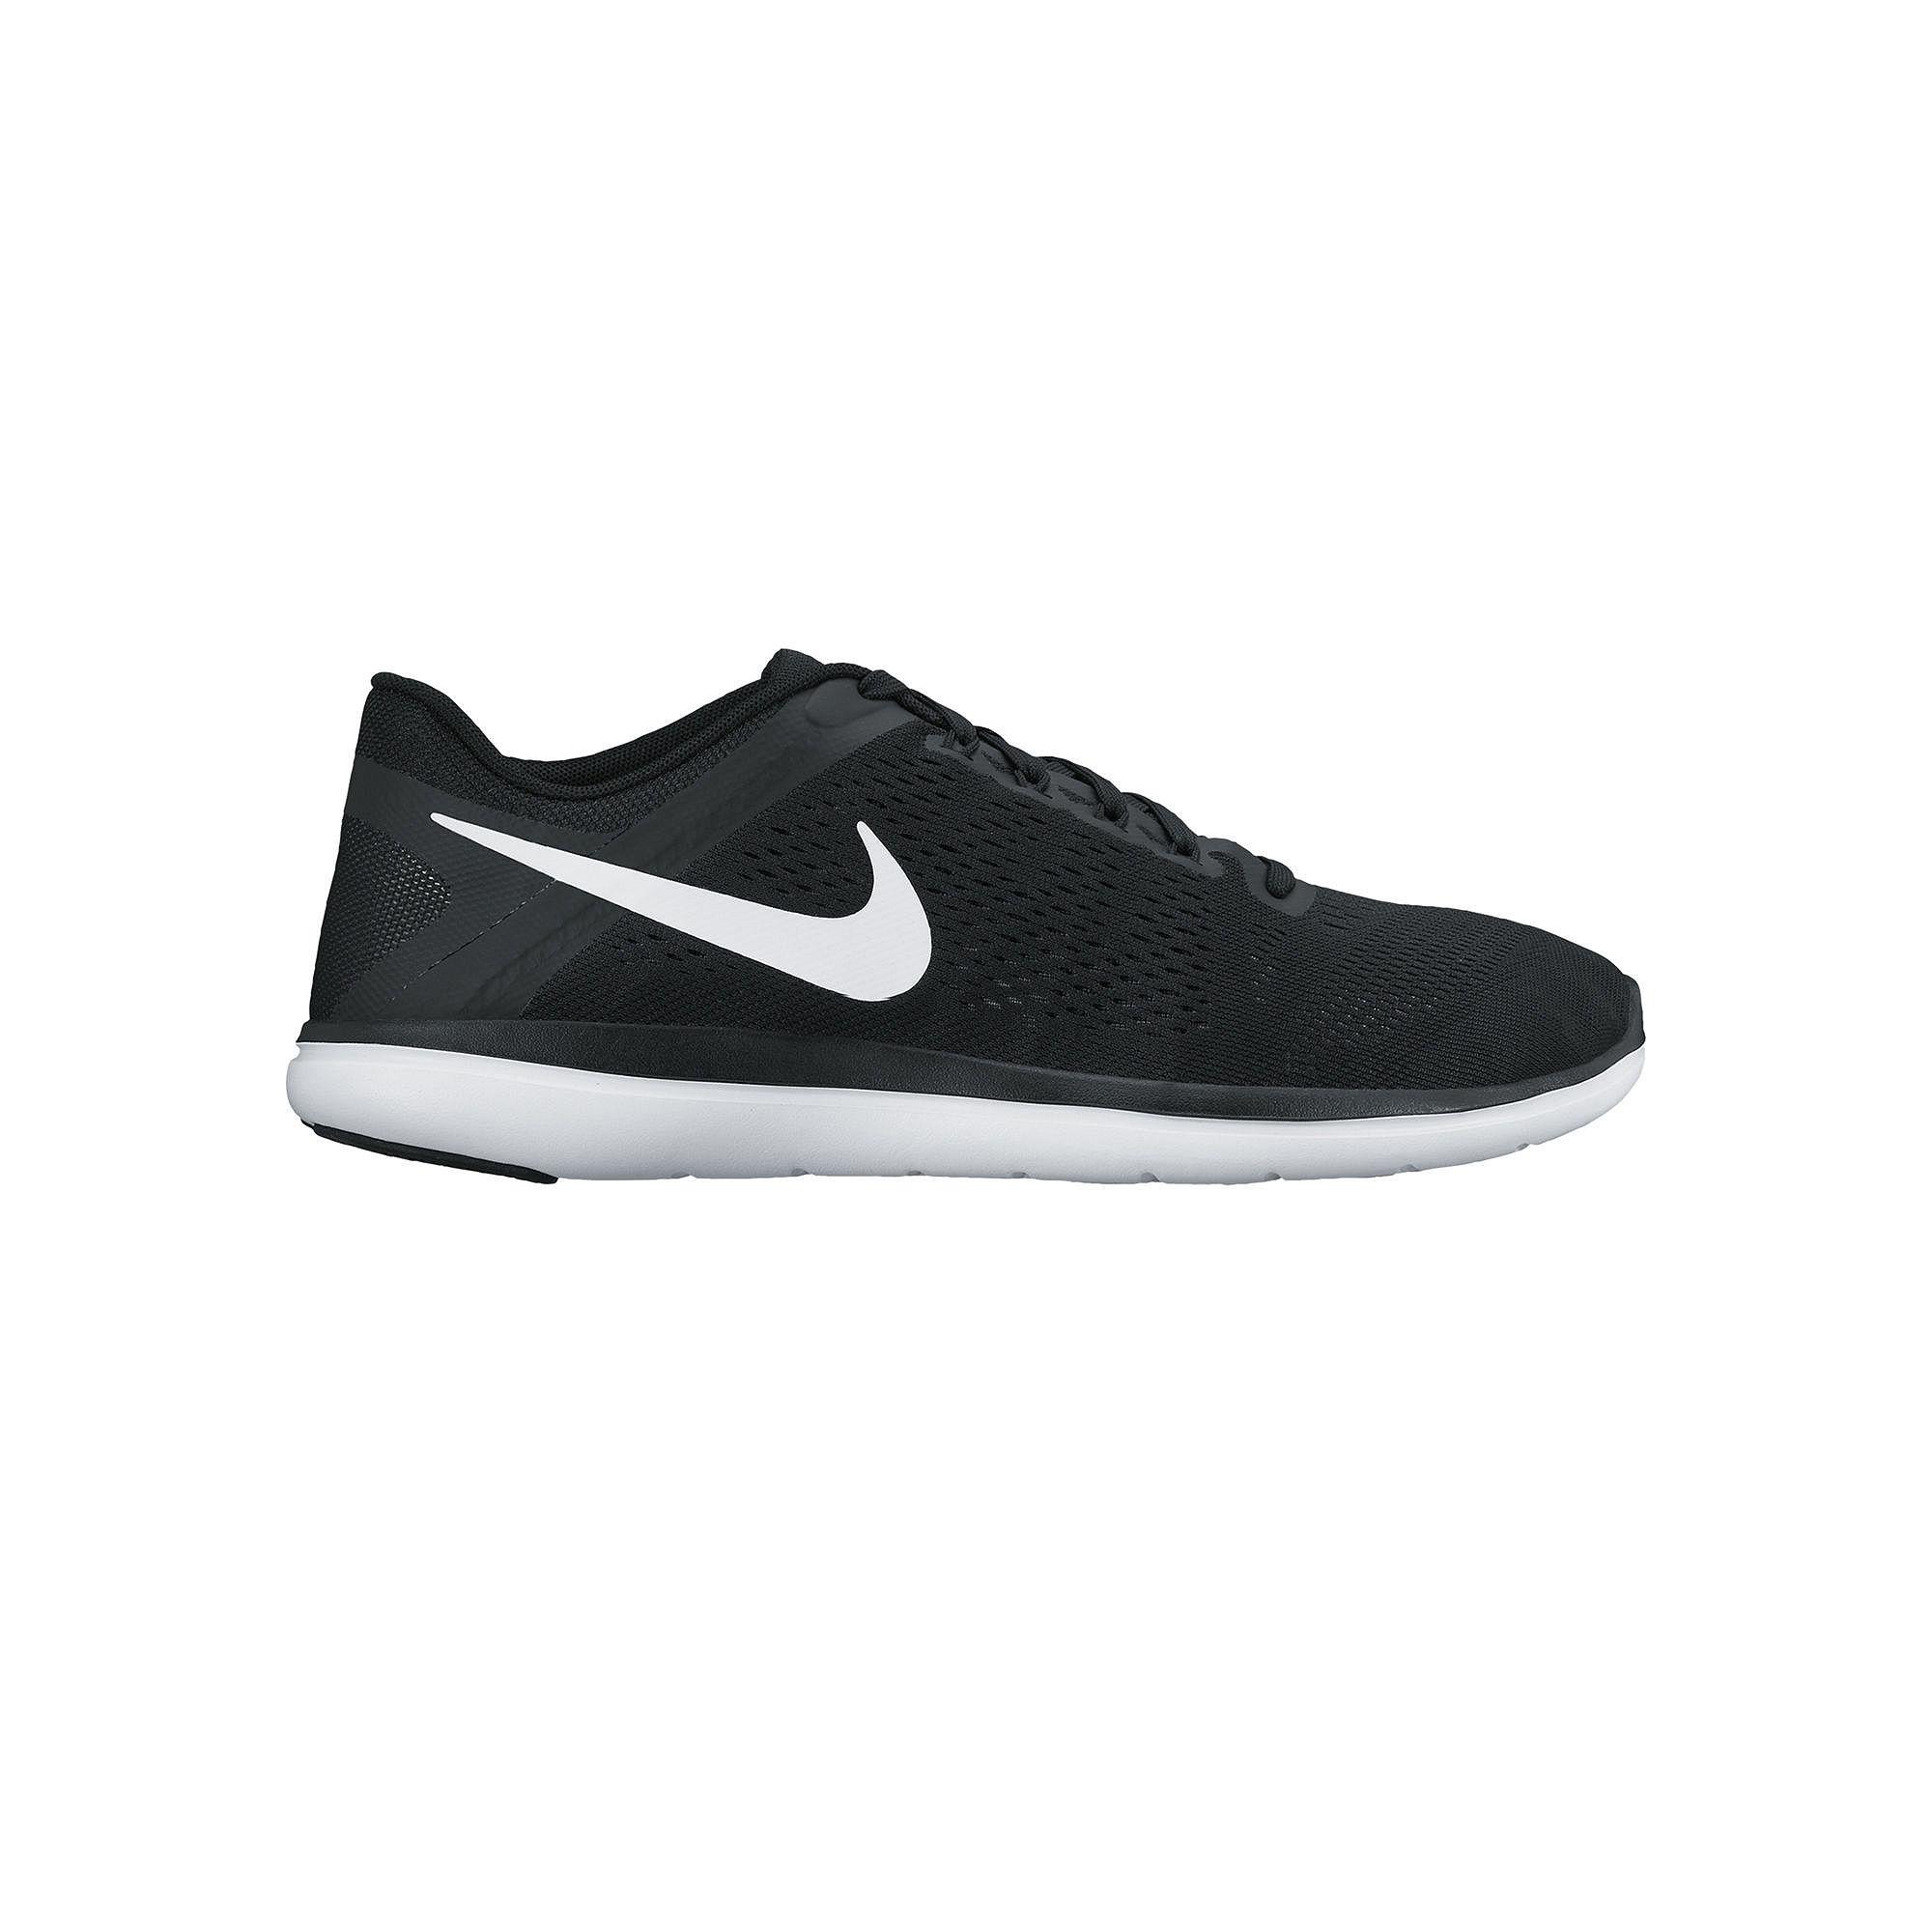 66e88621955 UPC 886548702657 product image for Nike Flex Mens Running Shoes